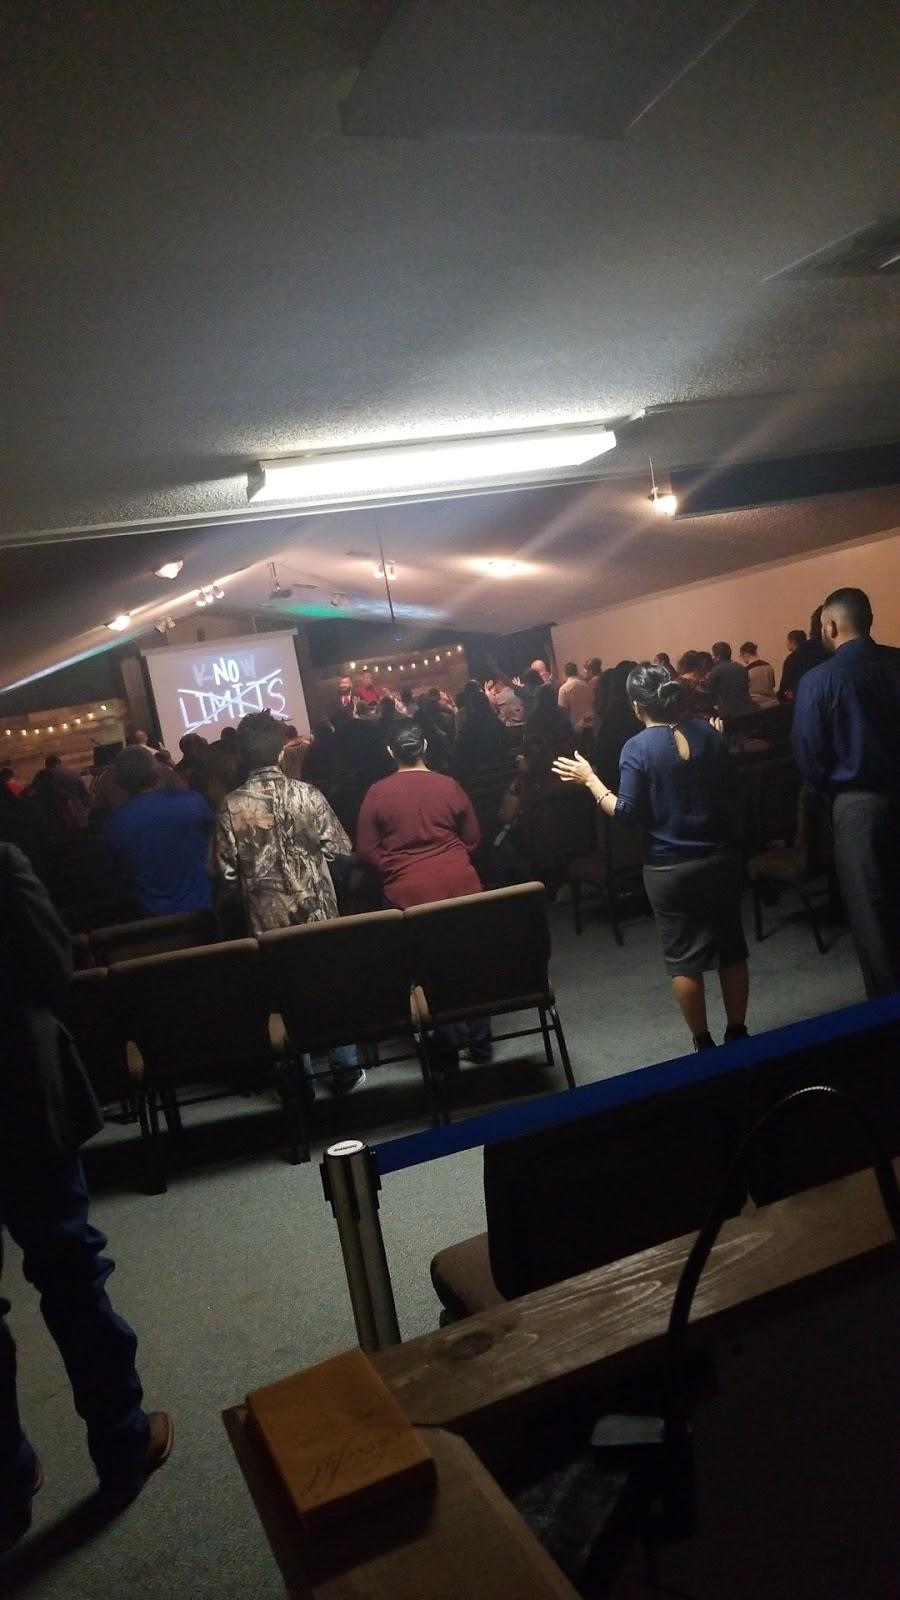 Mt. Zion Revival Center - church  | Photo 7 of 7 | Address: 2106 Jones Rd, Beeville, TX 78102, USA | Phone: (361) 343-5622